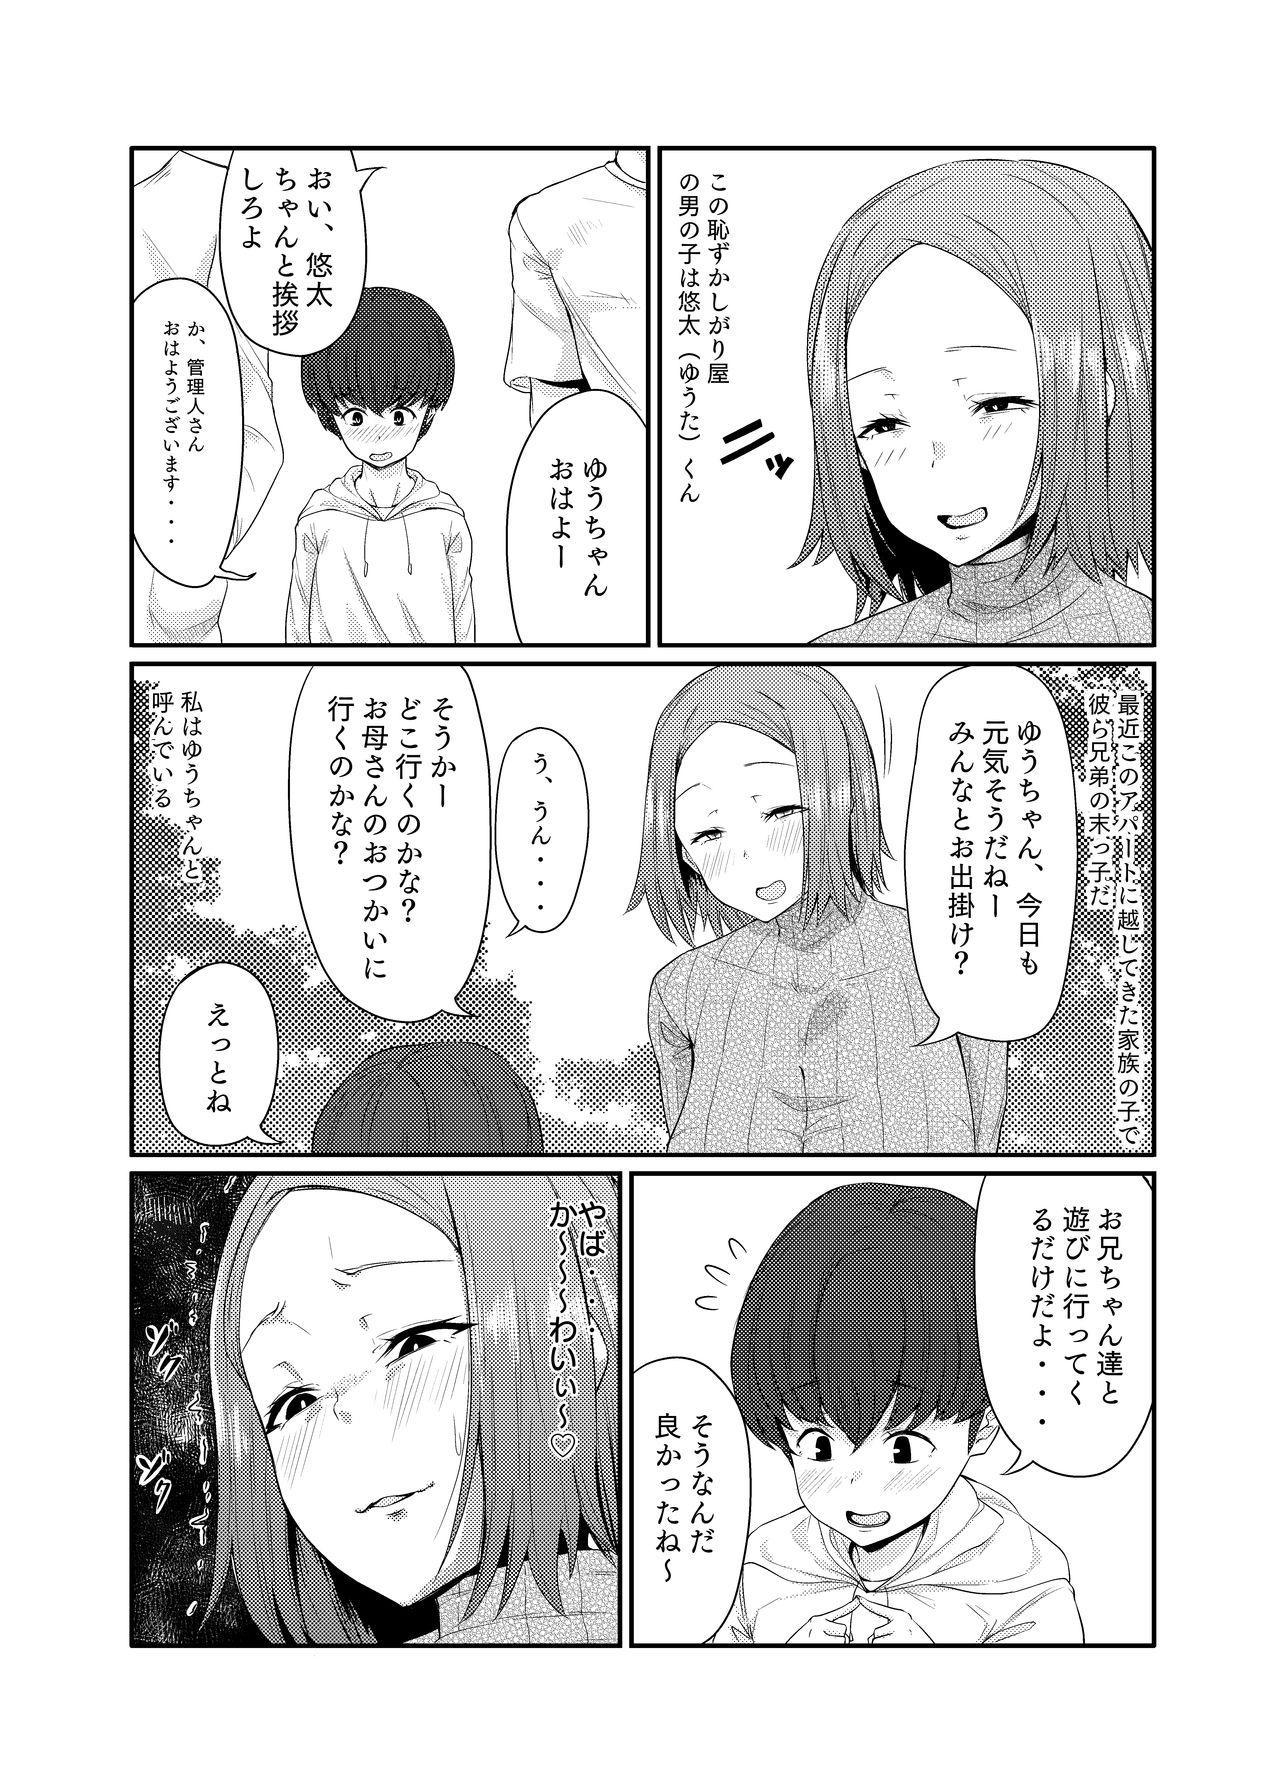 Kanrinin-san wa Mirareta!! 2